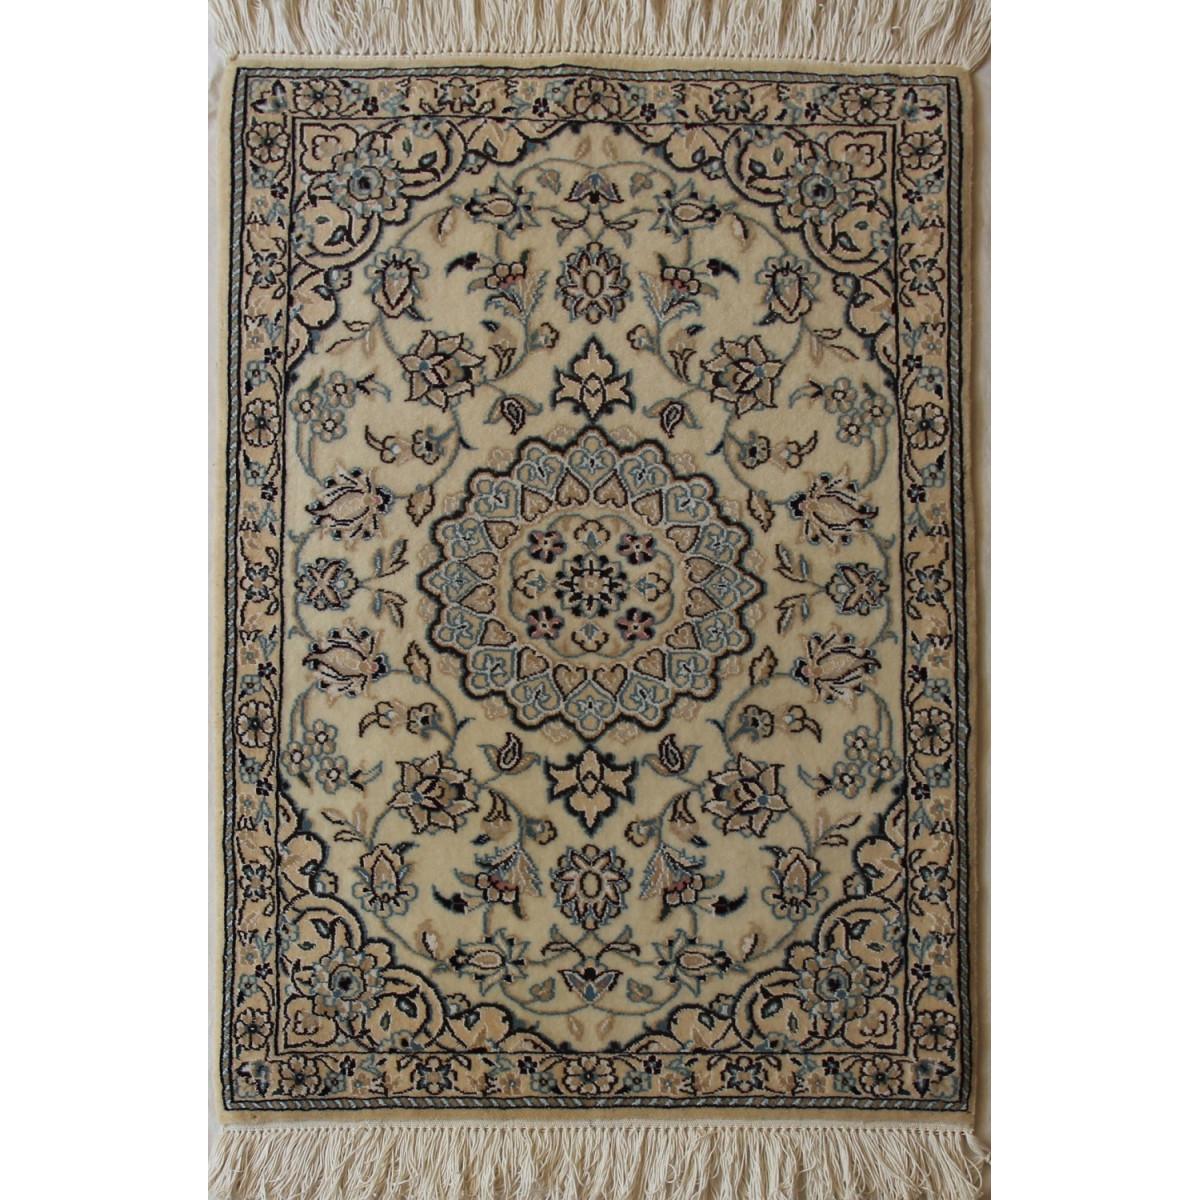 Nain Persian Wool & Silk Rug - PRN1009-Persian Handicrafts